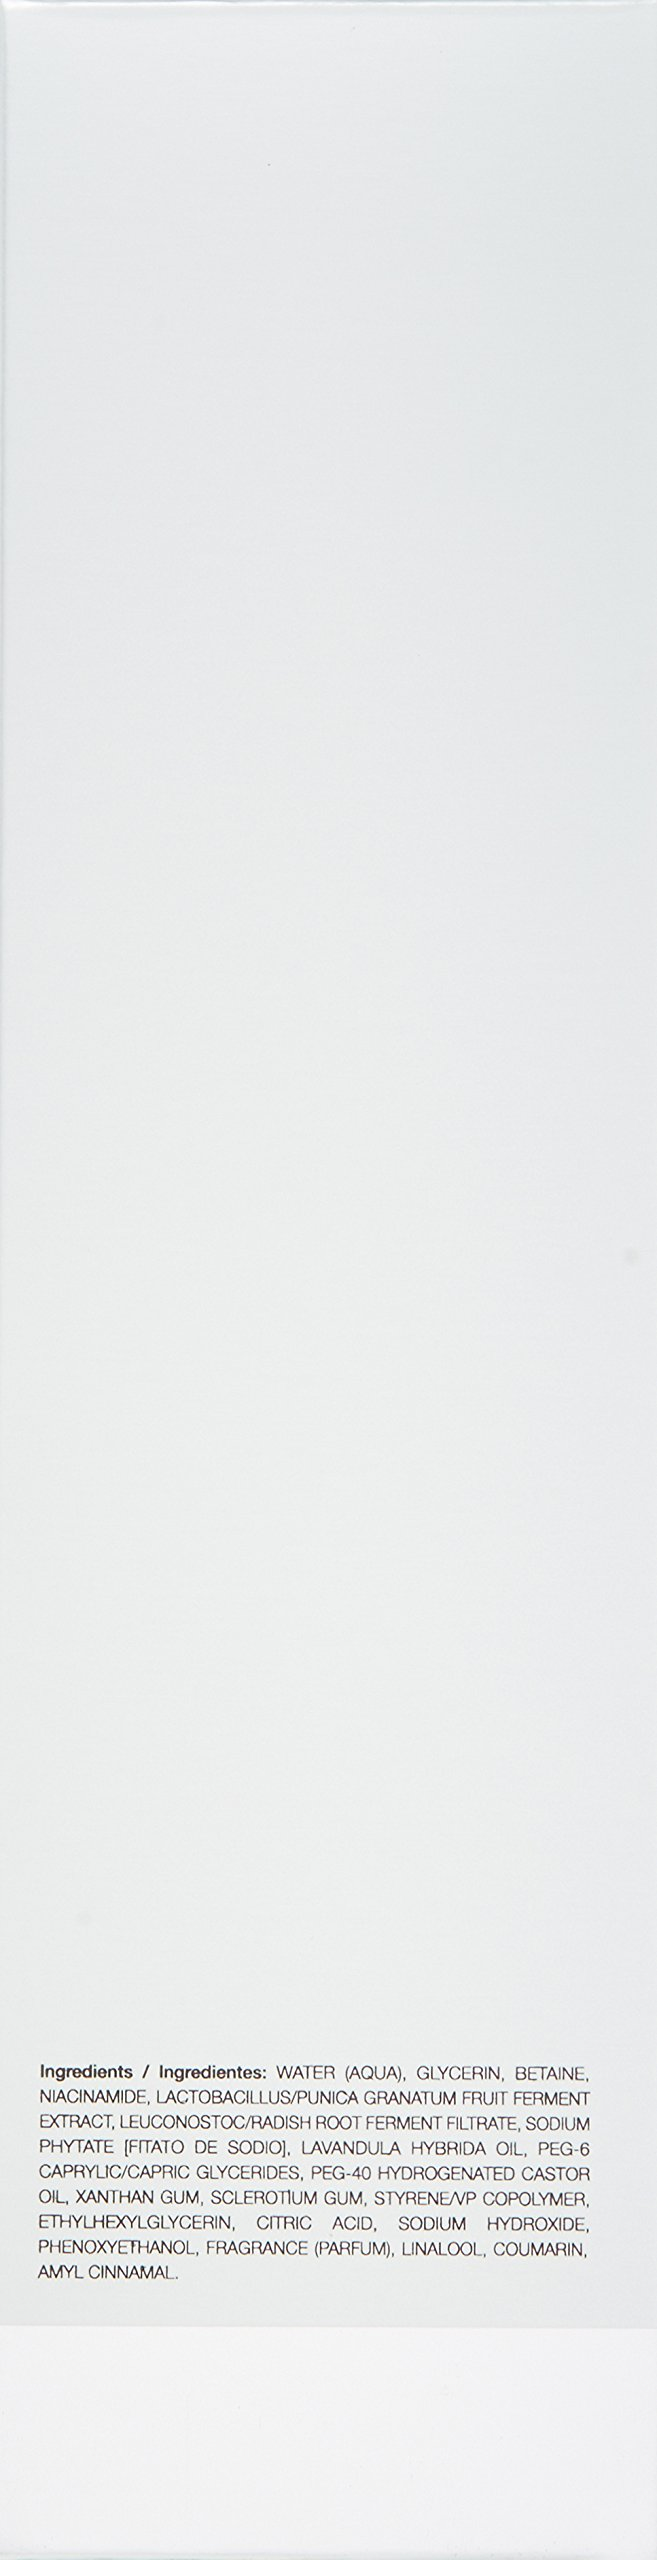 Natura Bisse Diamond White Clarity Toning Lotion, 7.0 fl. oz. by Natura Bisse (Image #4)